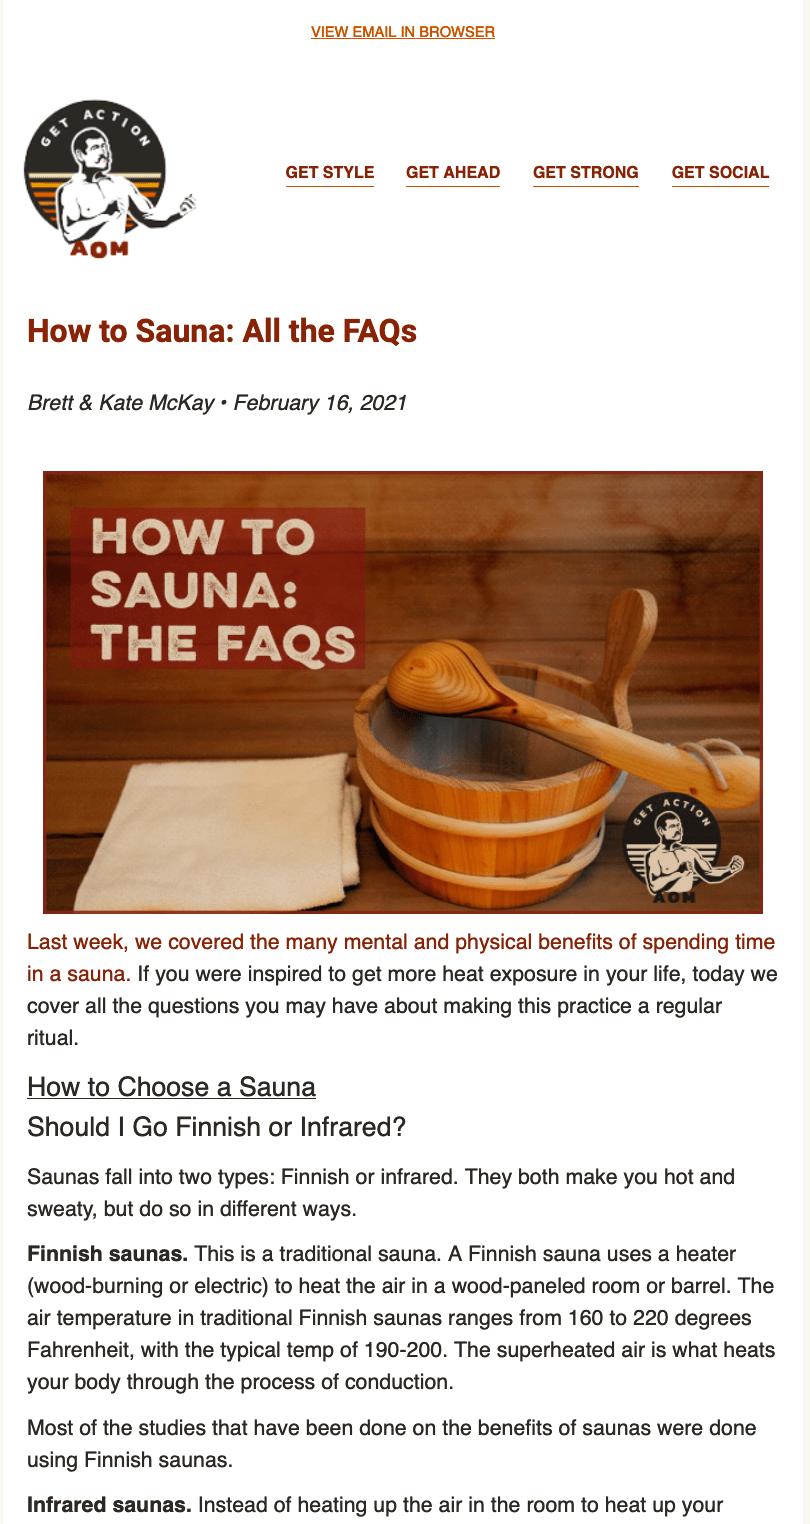 Пример FAQ раздела email рассылки от компании Brett & Kate